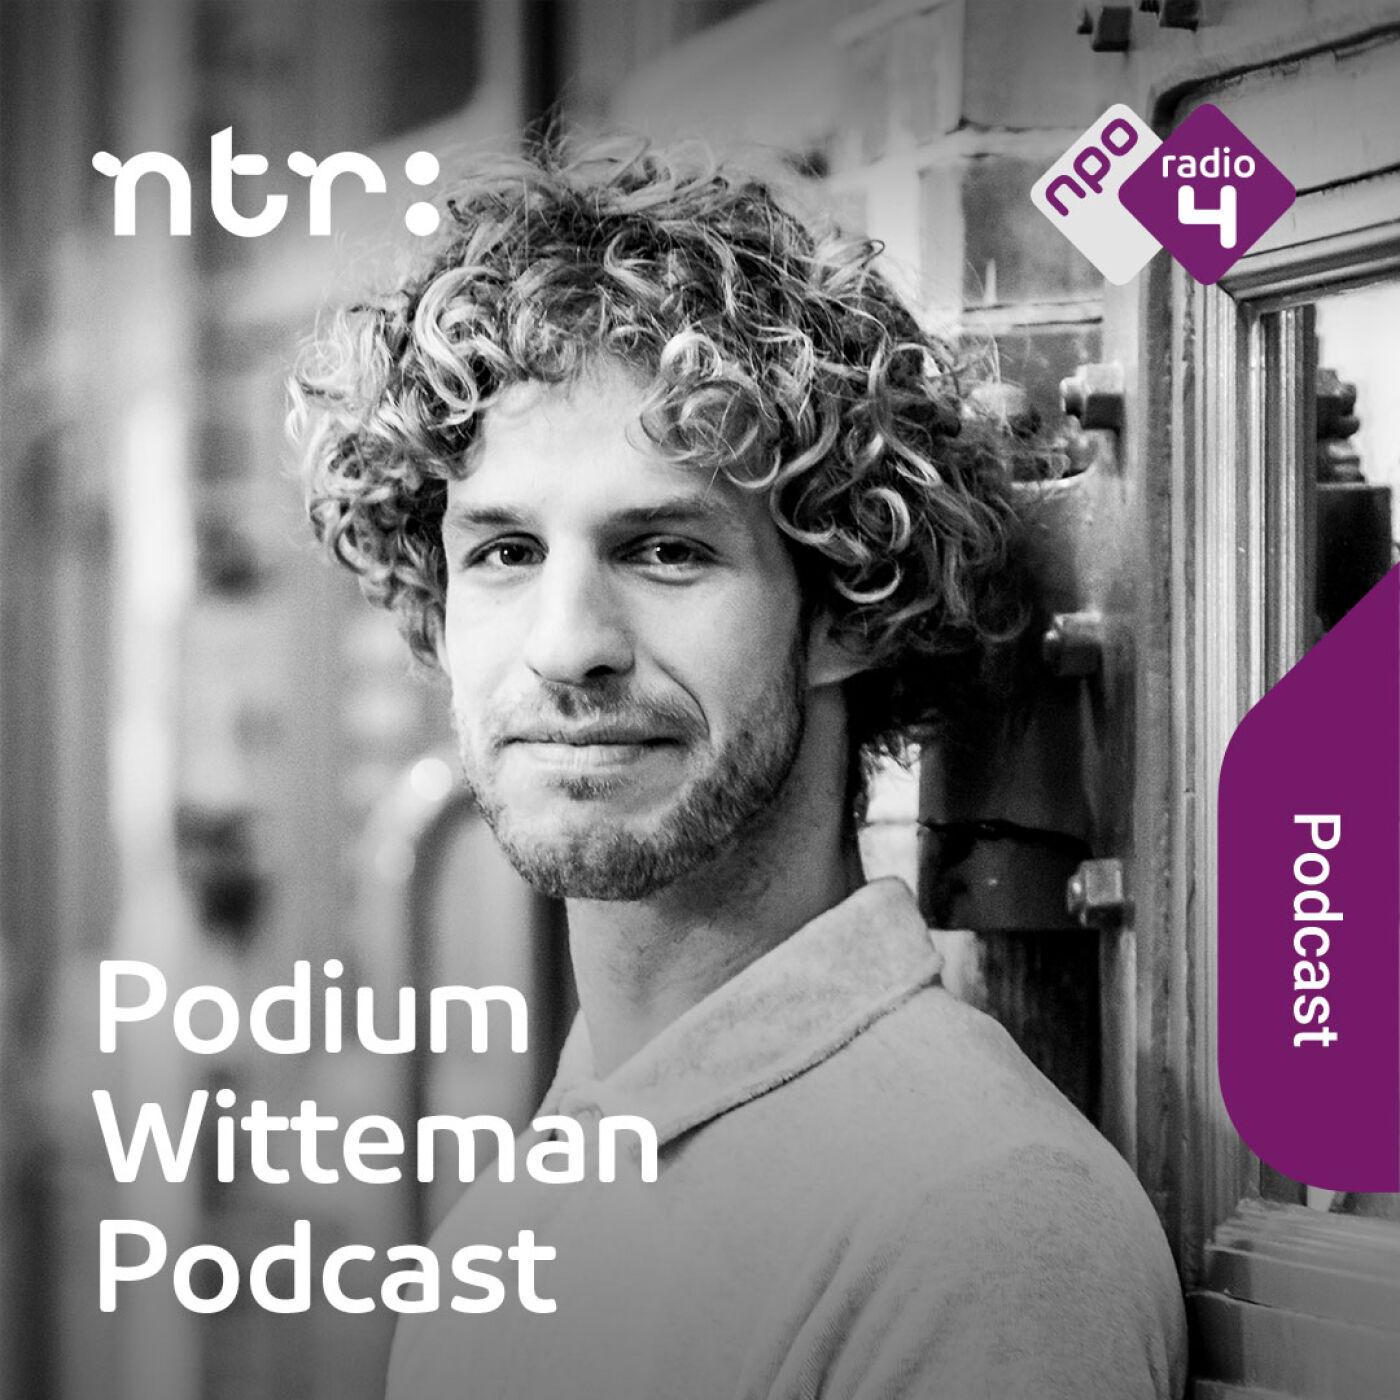 Podium Witteman Podcast logo